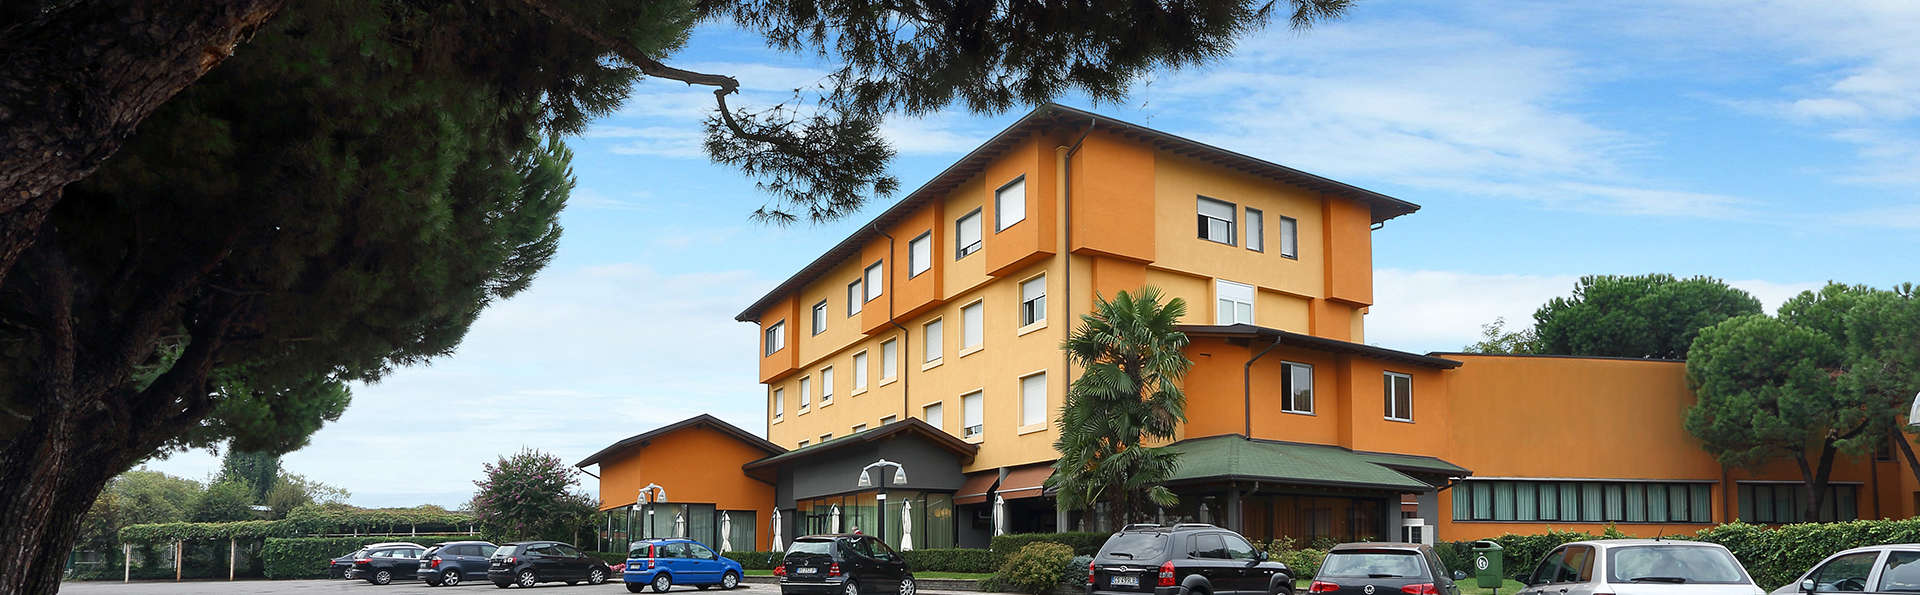 Hotel La Torretta - edit_front.jpg